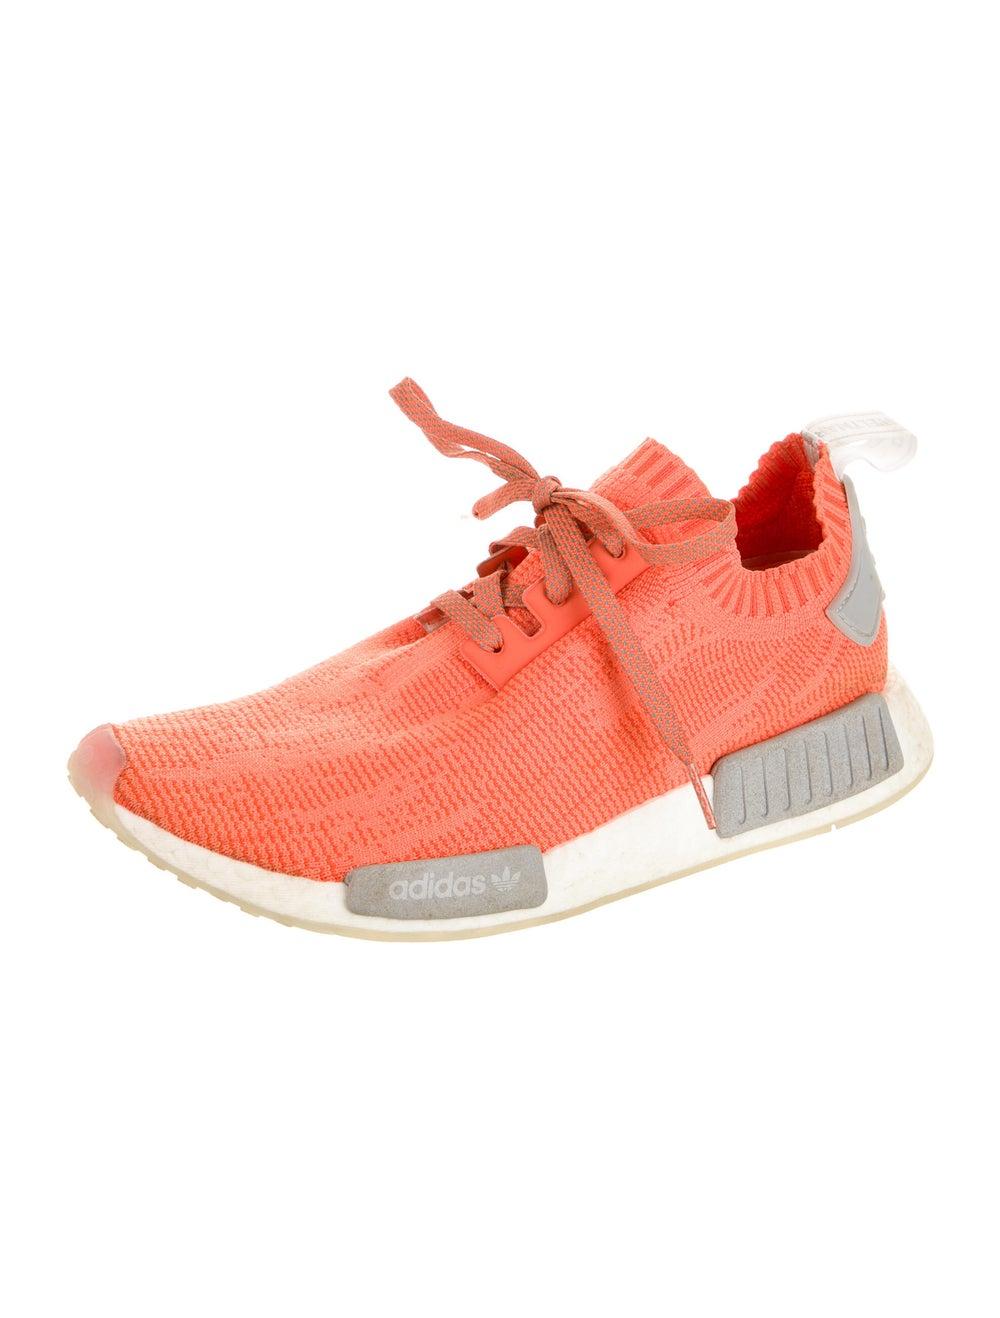 Adidas Athletic Sneakers Orange - image 2